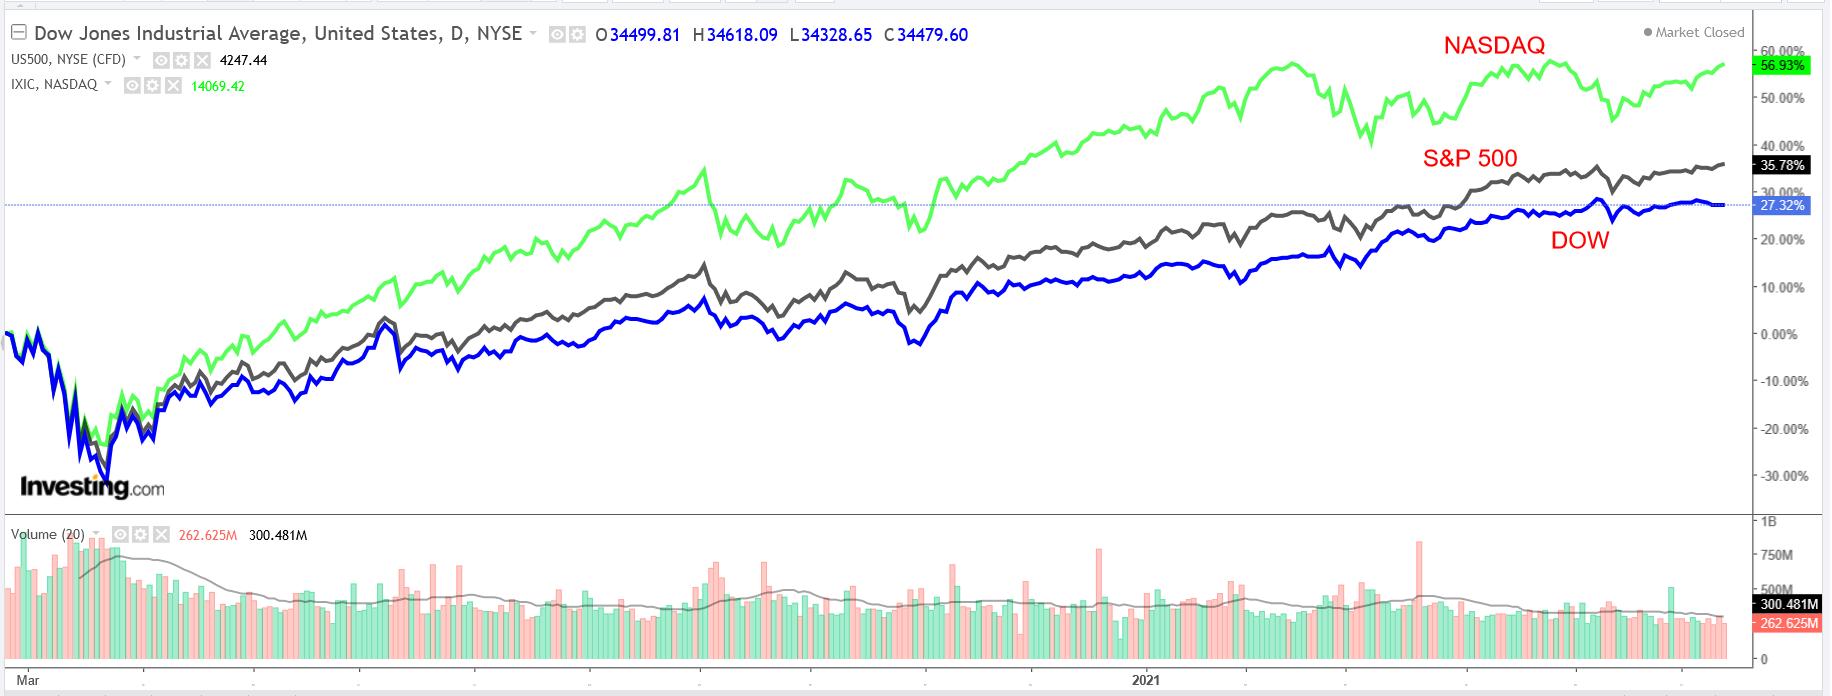 Dow, SP, NASDAQ Daily Charts